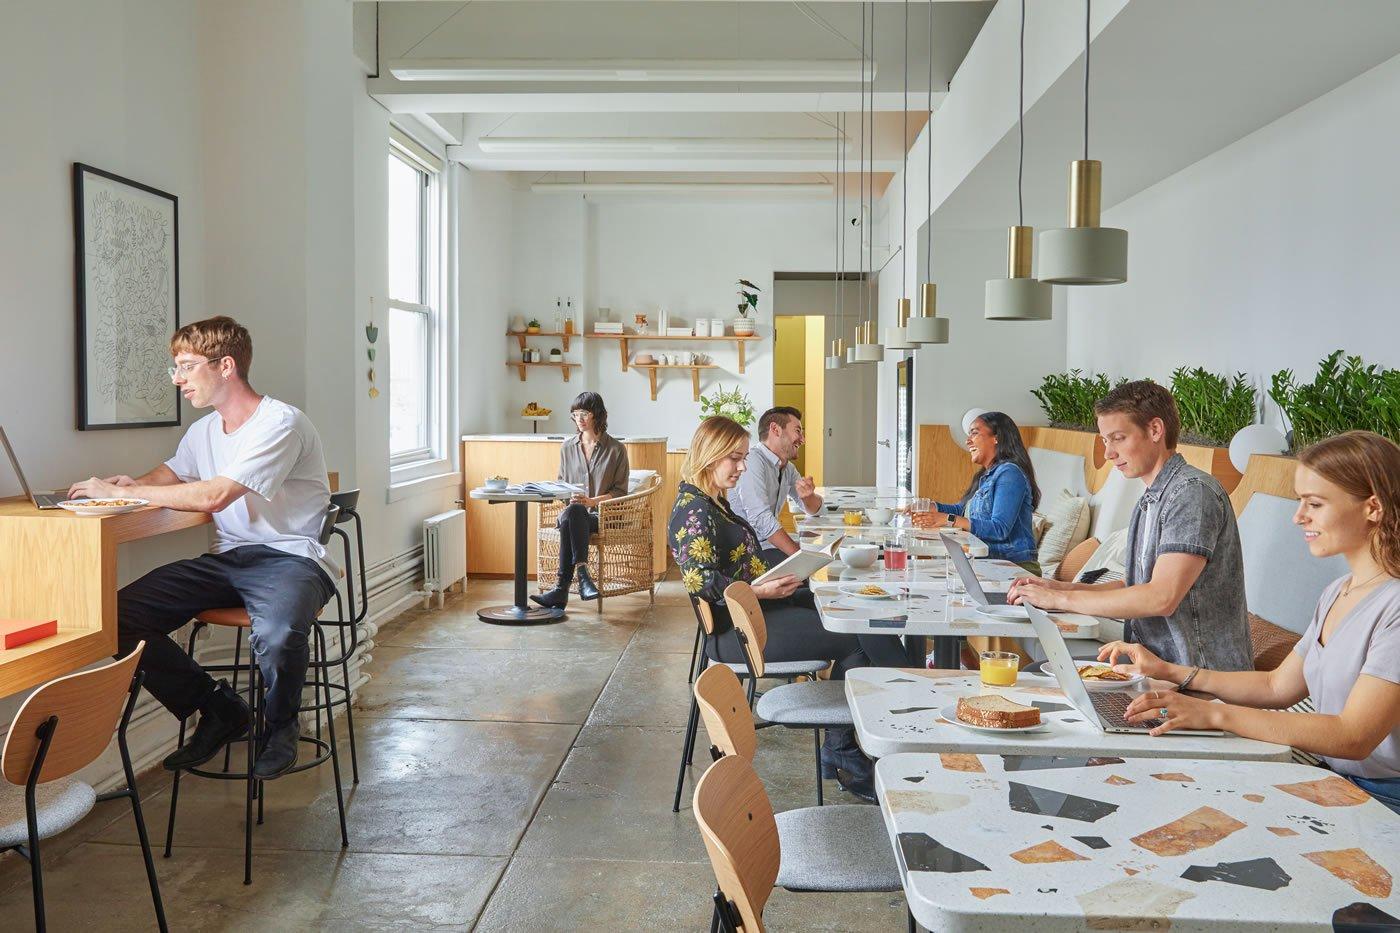 Interior Design Services - Office